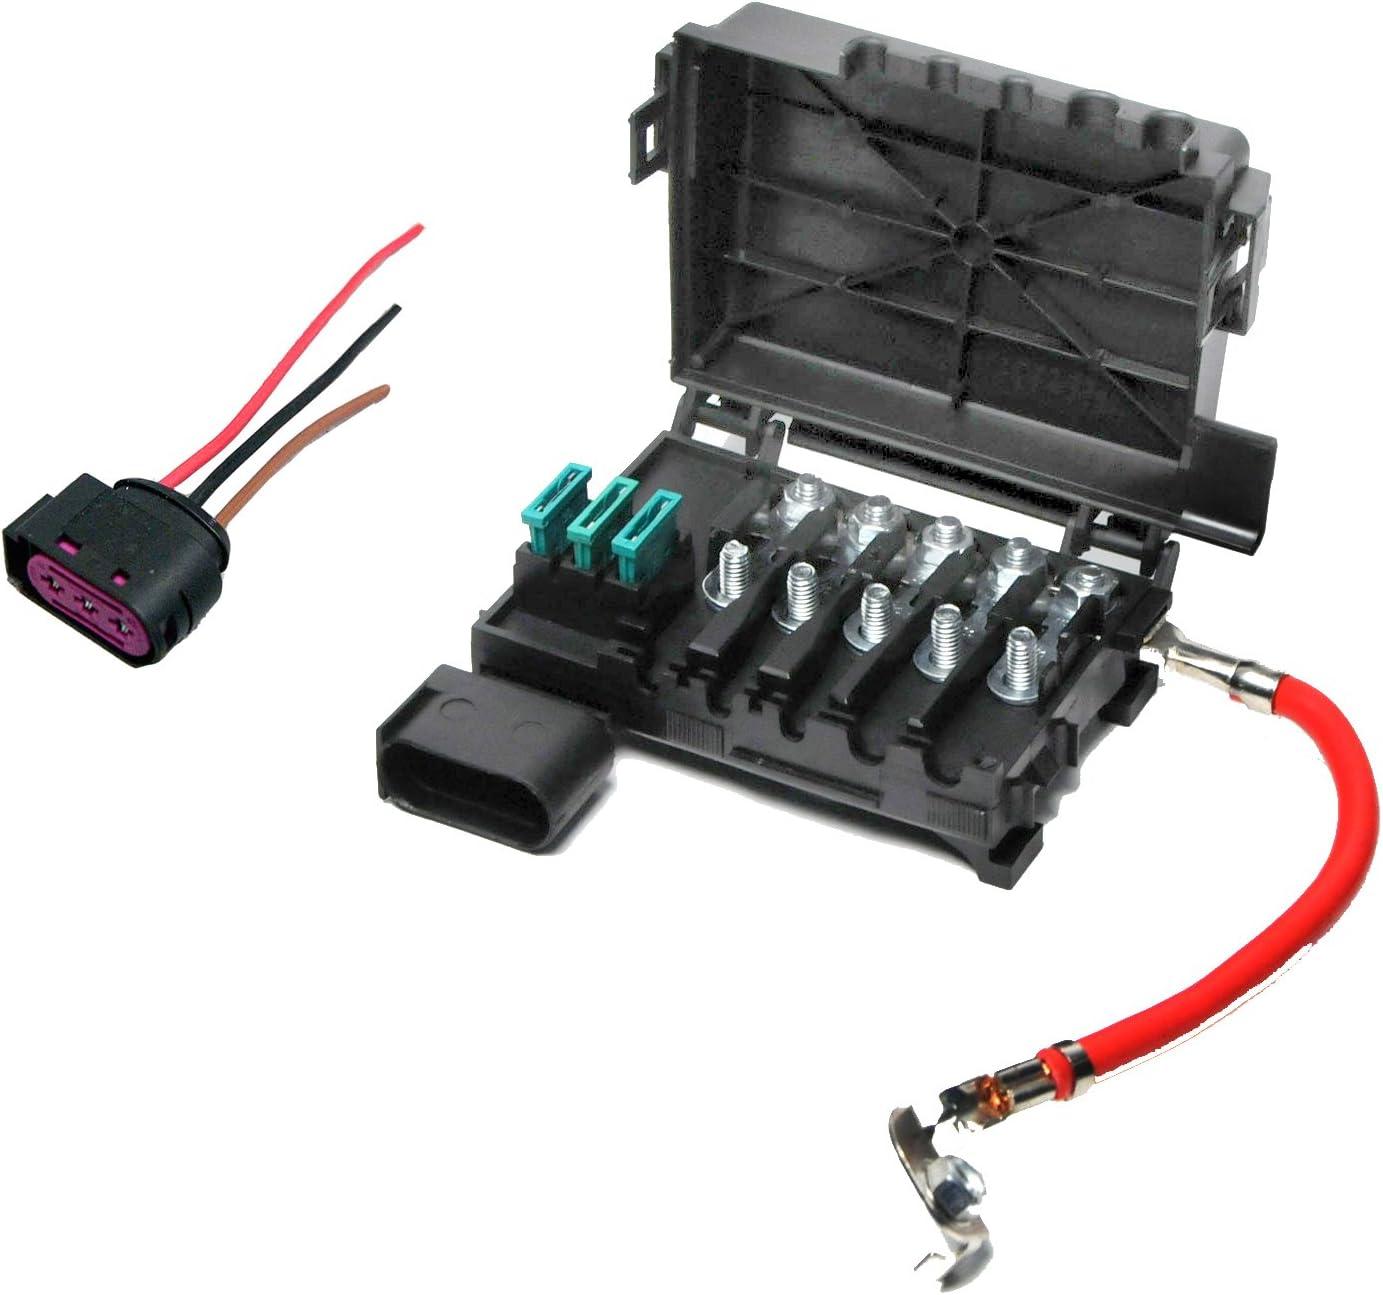 Amazon.com: Fuse Box with 3-Pin Plug and Harness 1J0 937 617D 773:  AutomotiveAmazon.com